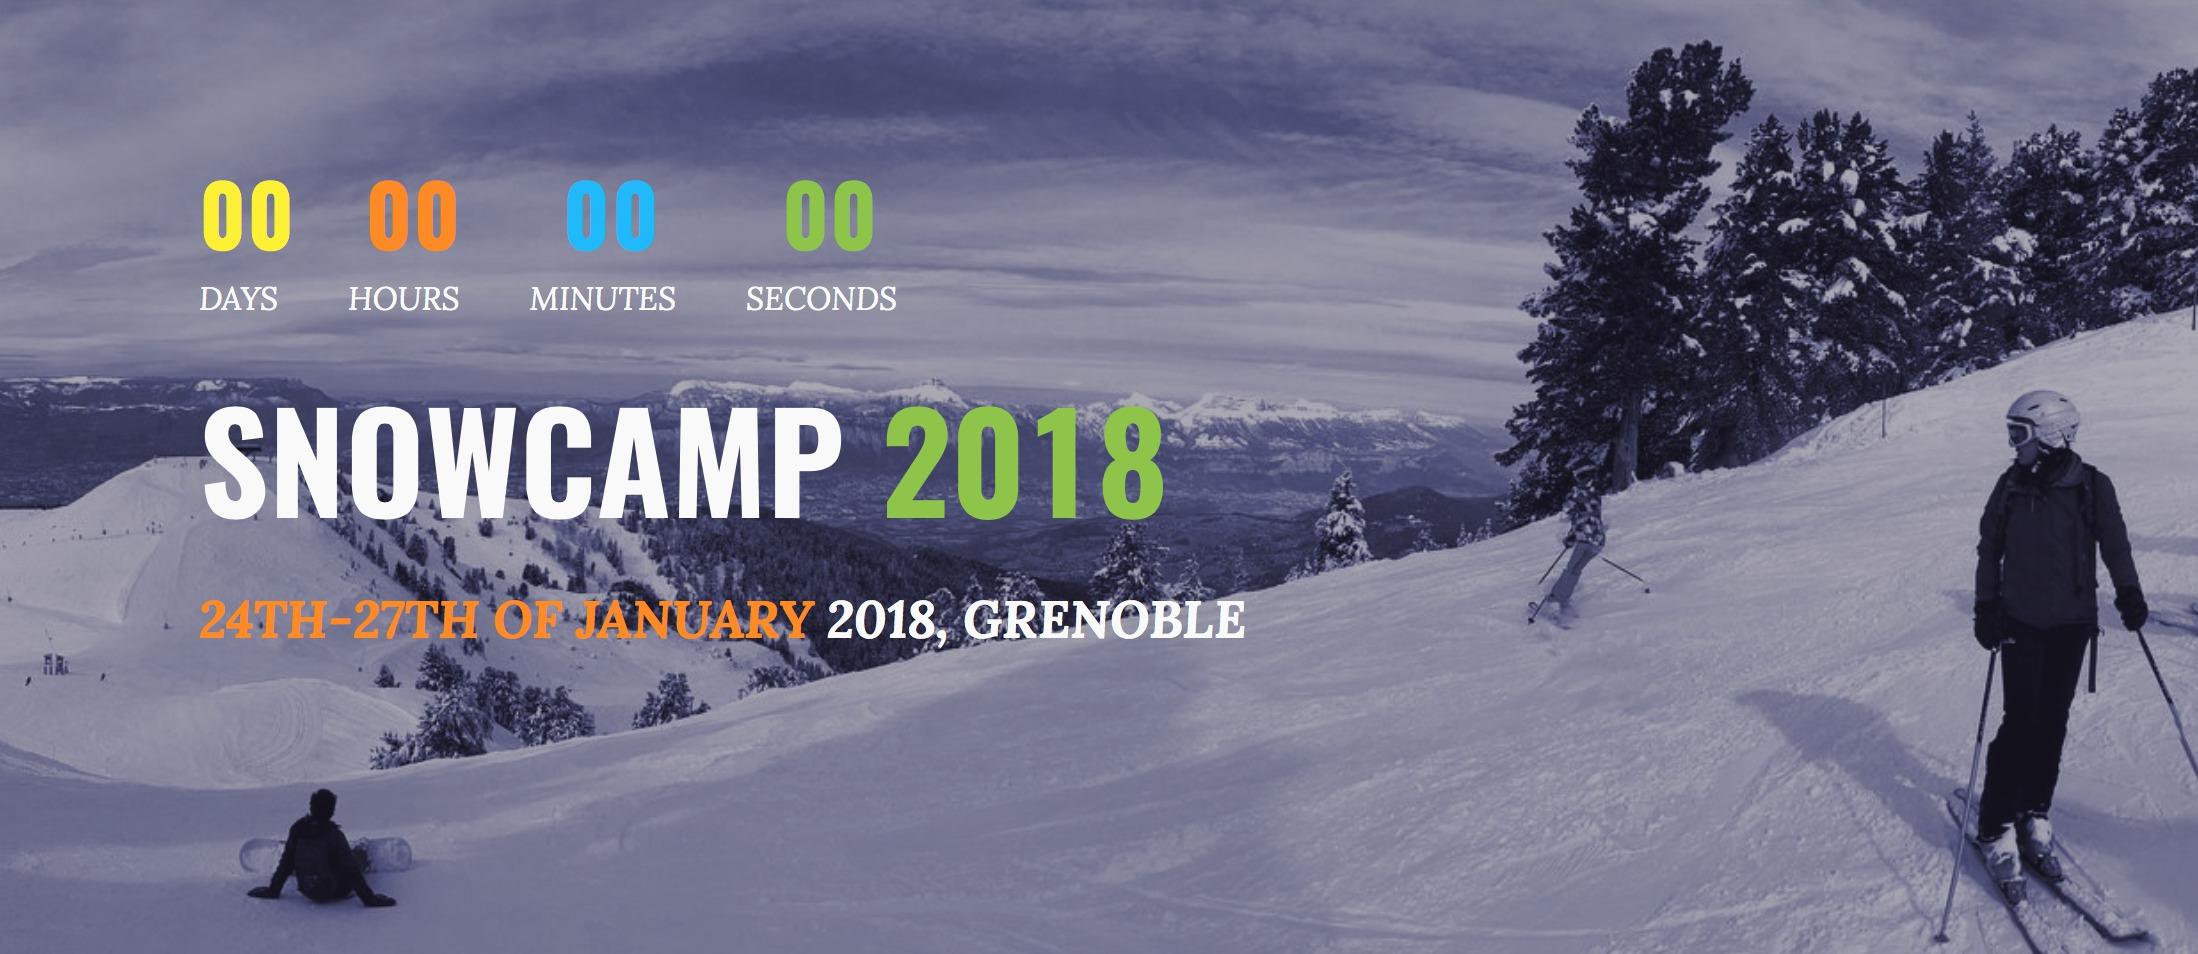 SnowCamp 2018 Trip Report